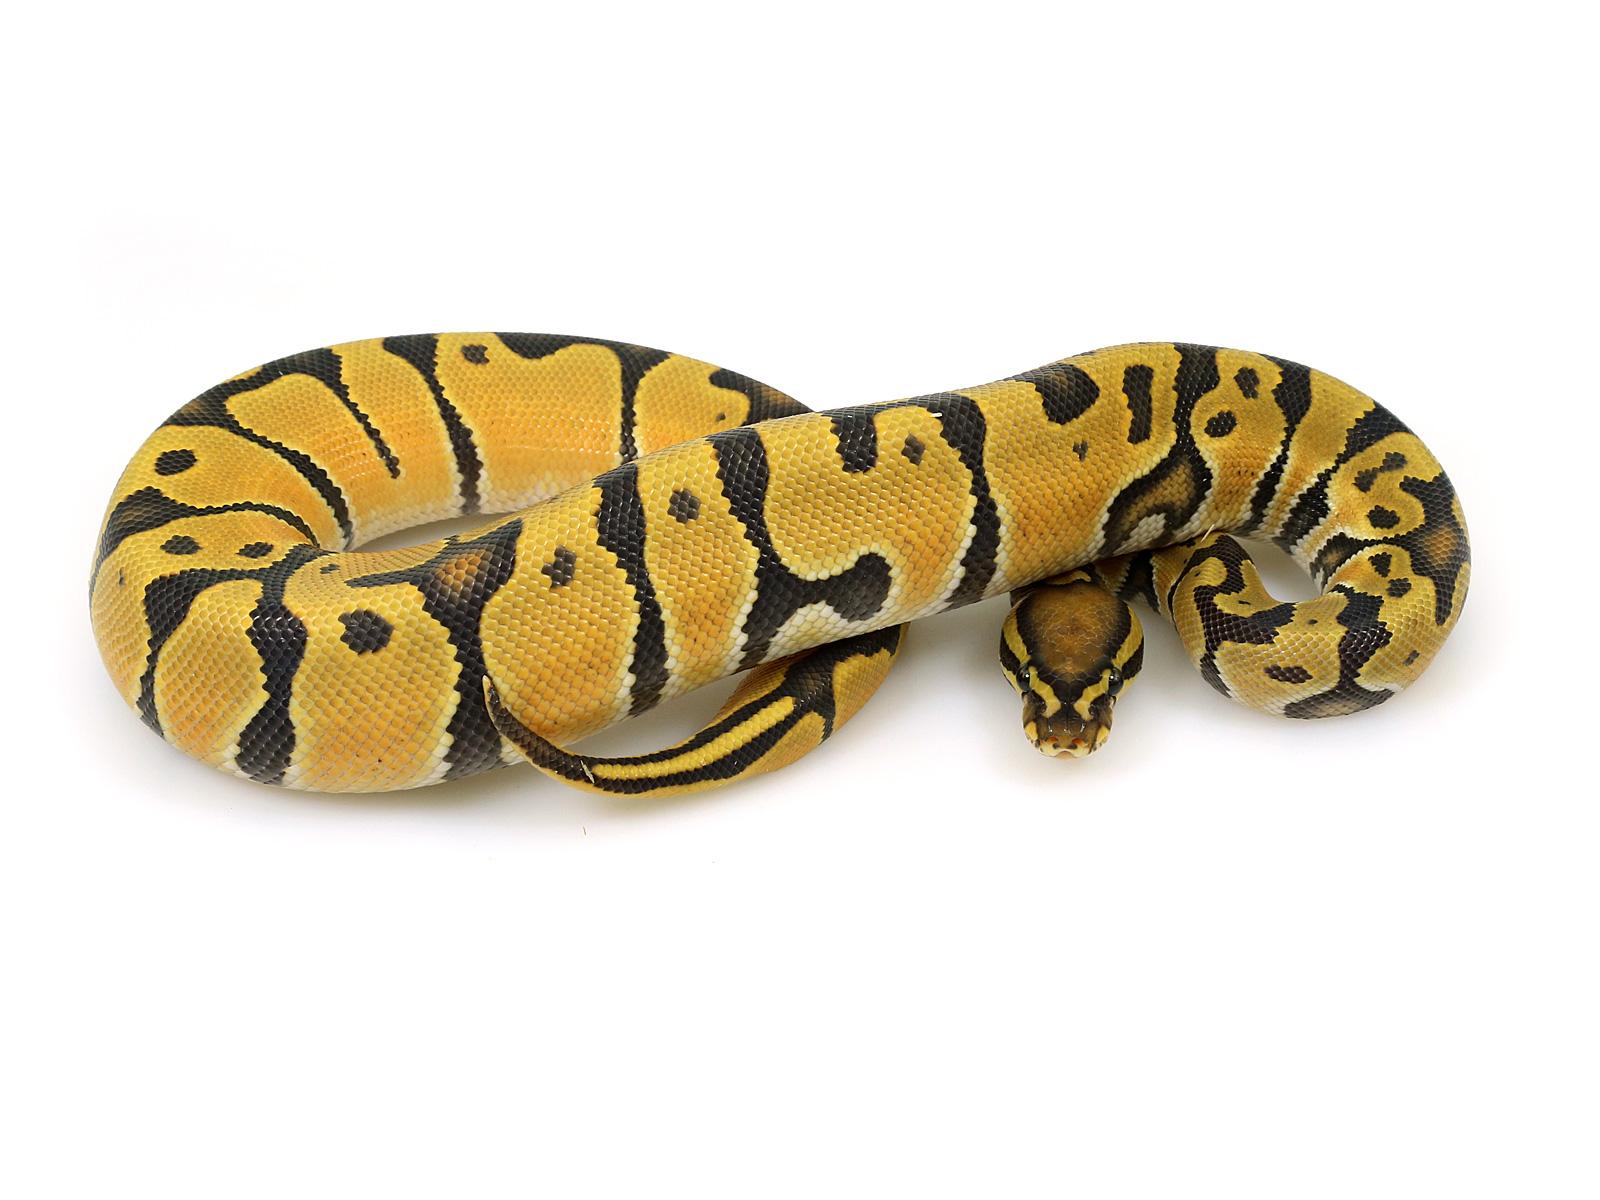 ball python, orange dream ghost